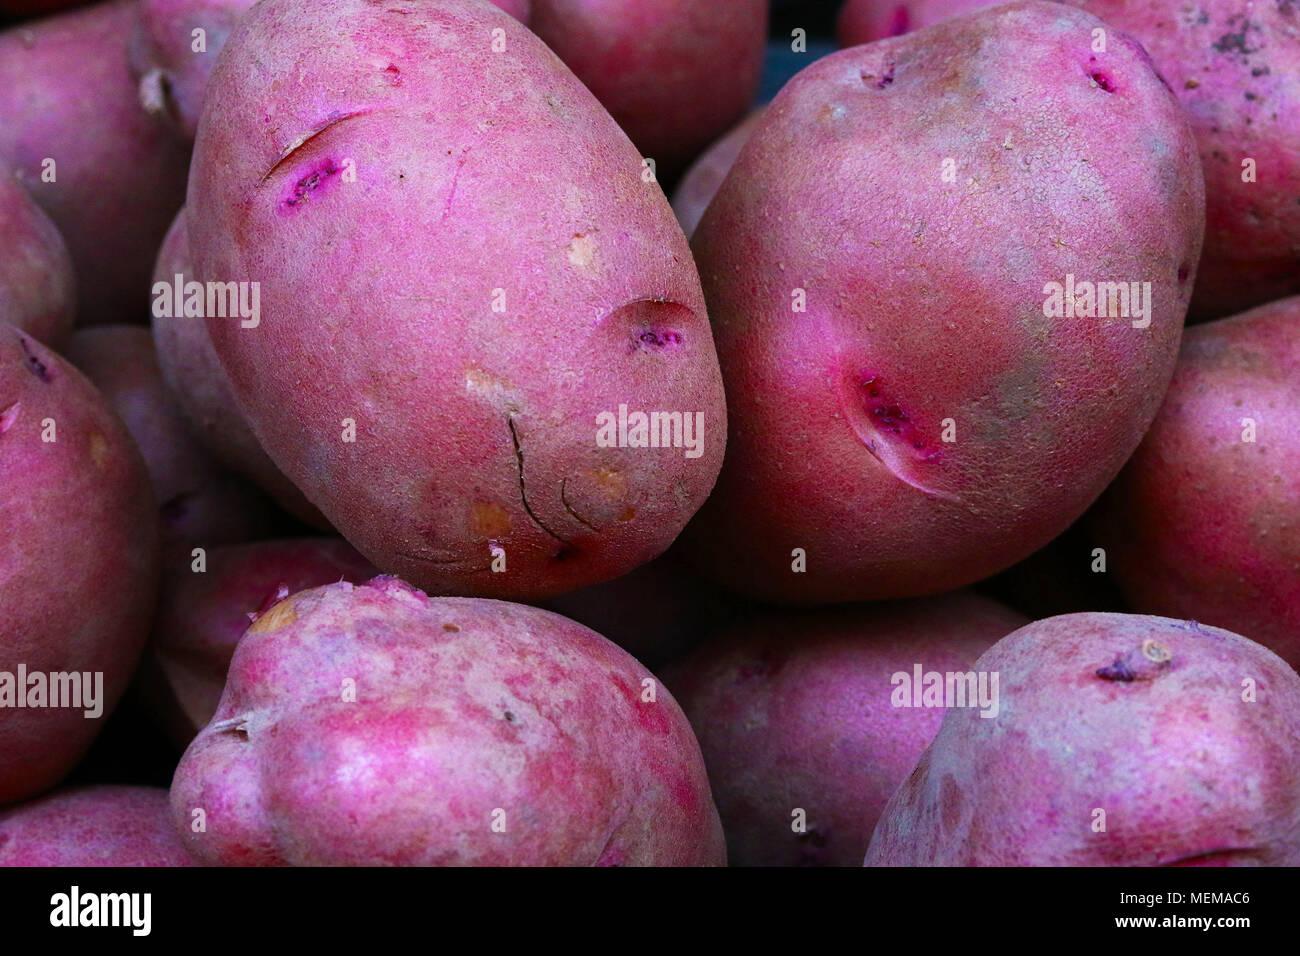 NY 118 Kartoffeln bei Farmer's Market gesehen Stockbild